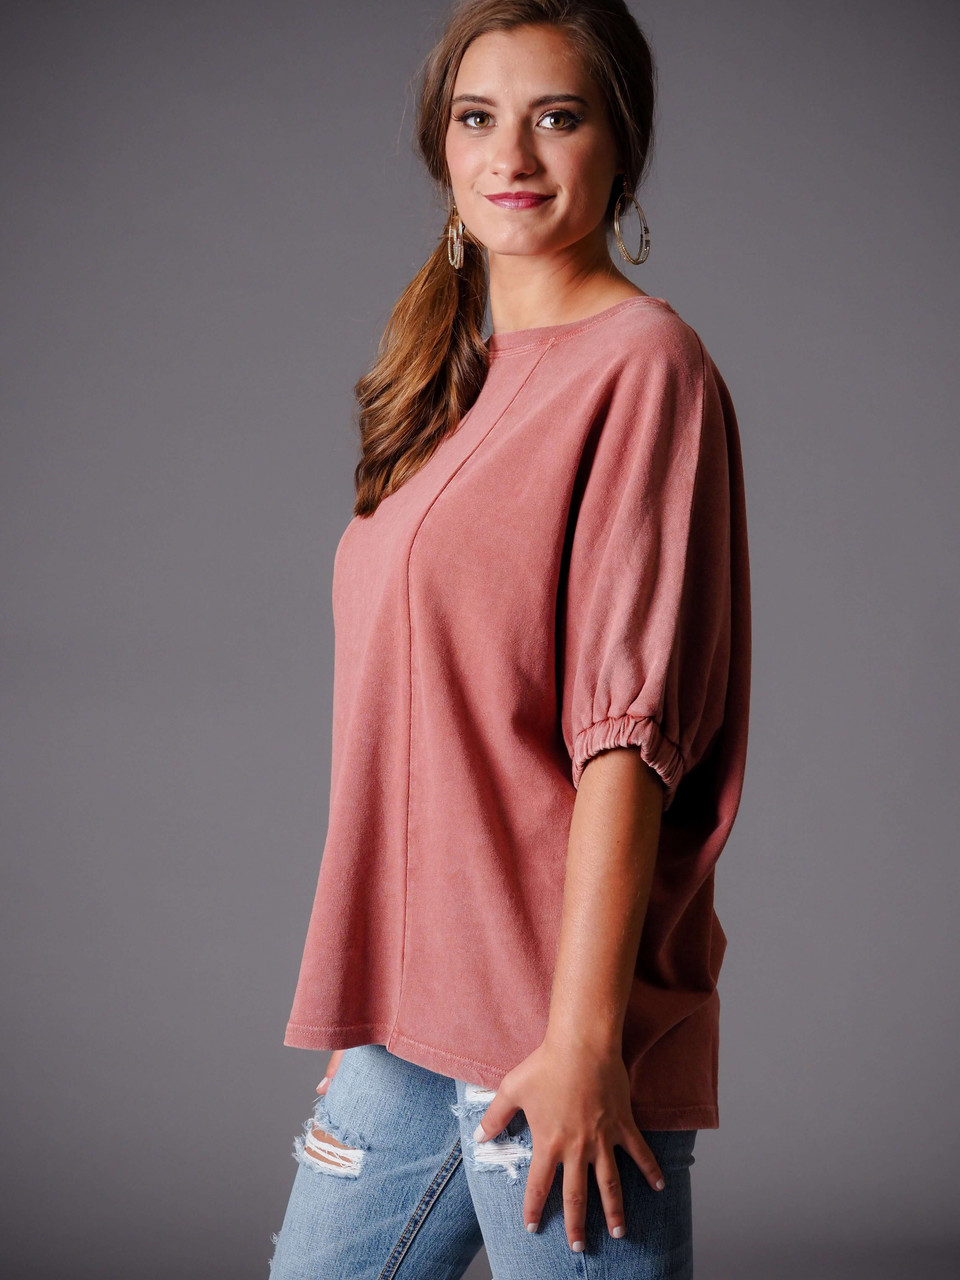 blush pink raspberry short sleeve knit top